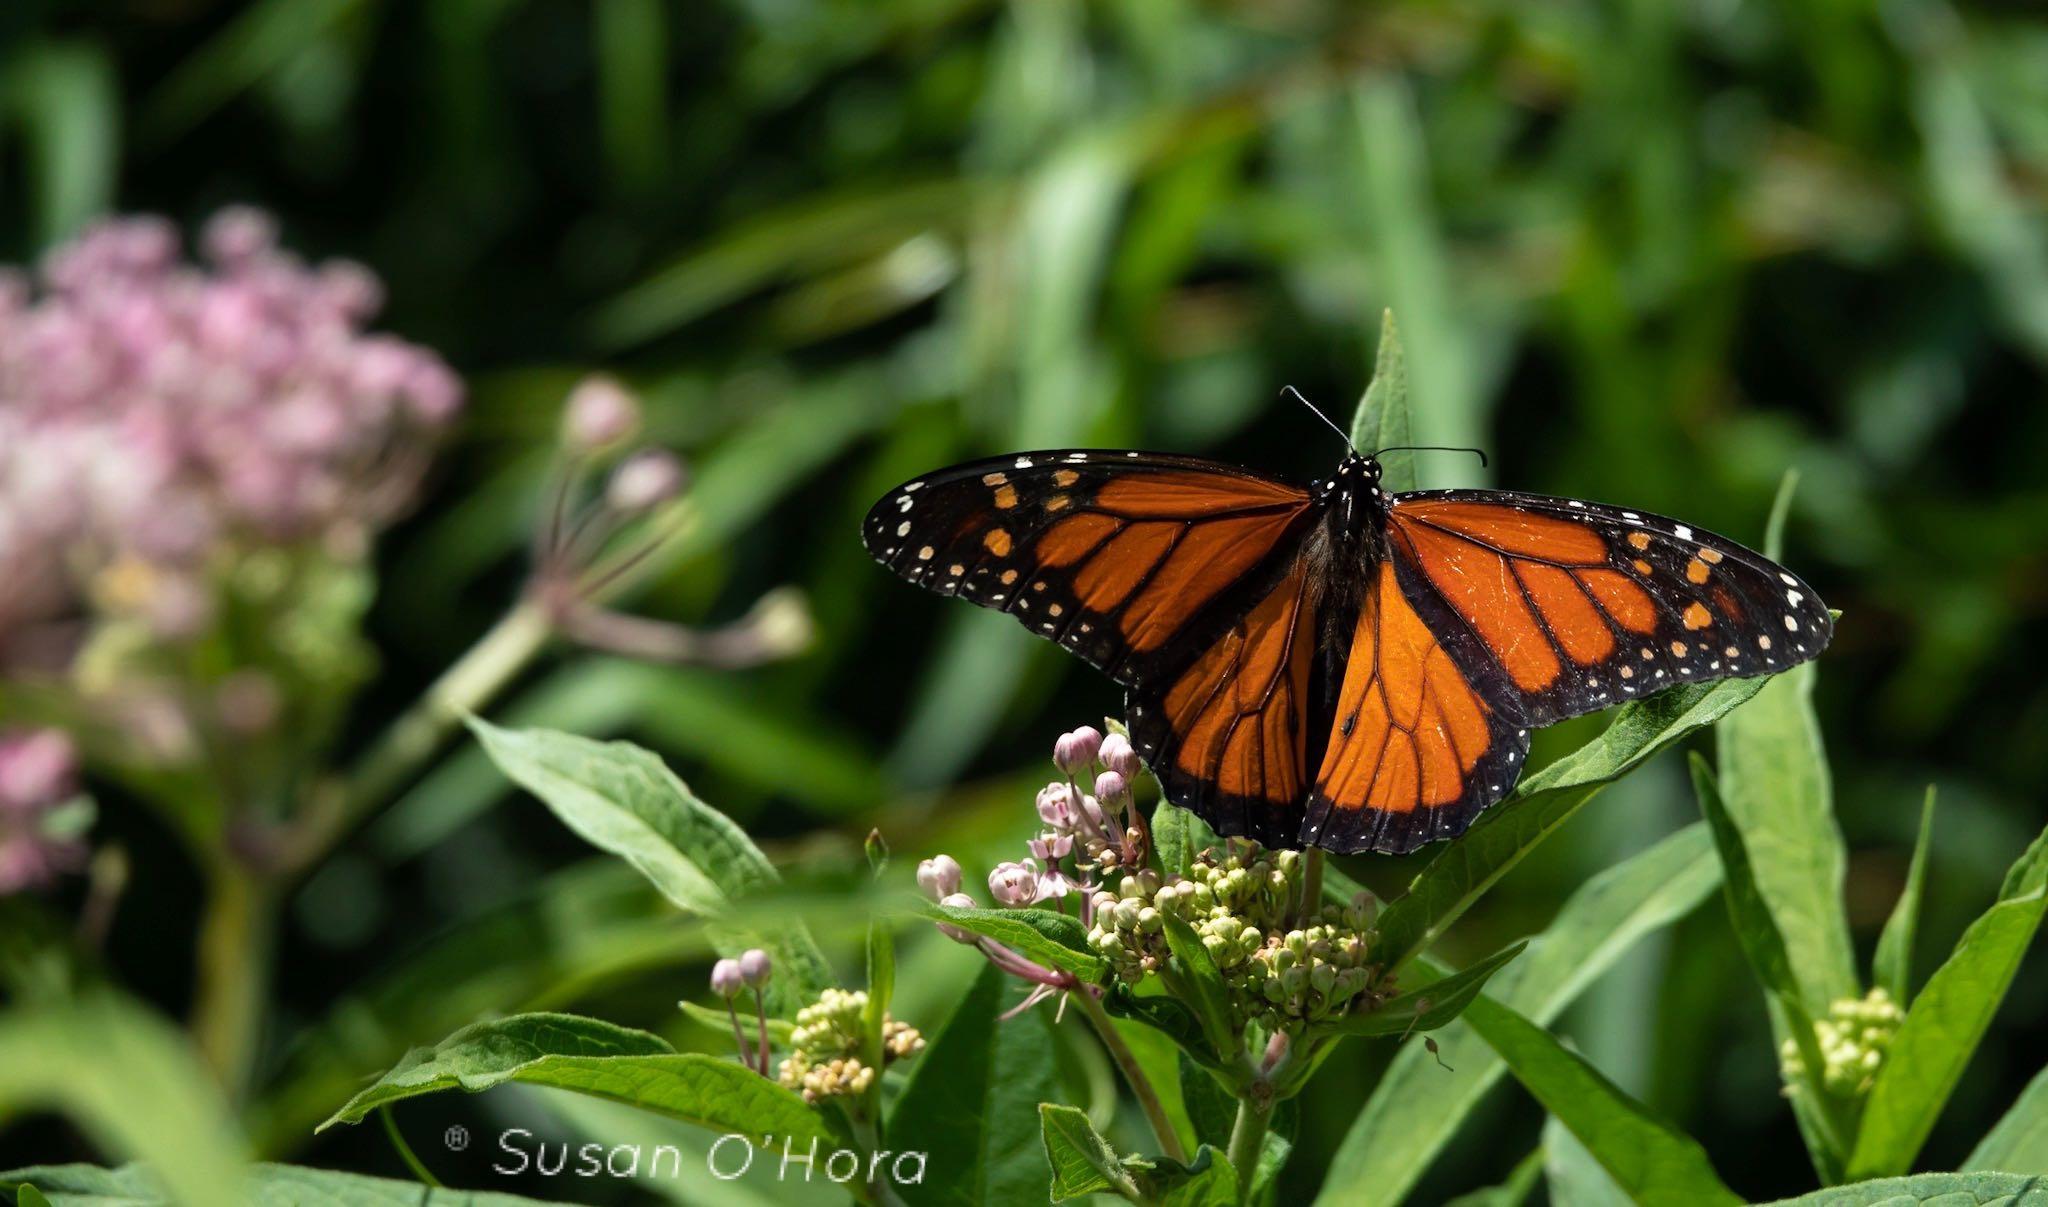 Butterfly_SOHORA.jpg